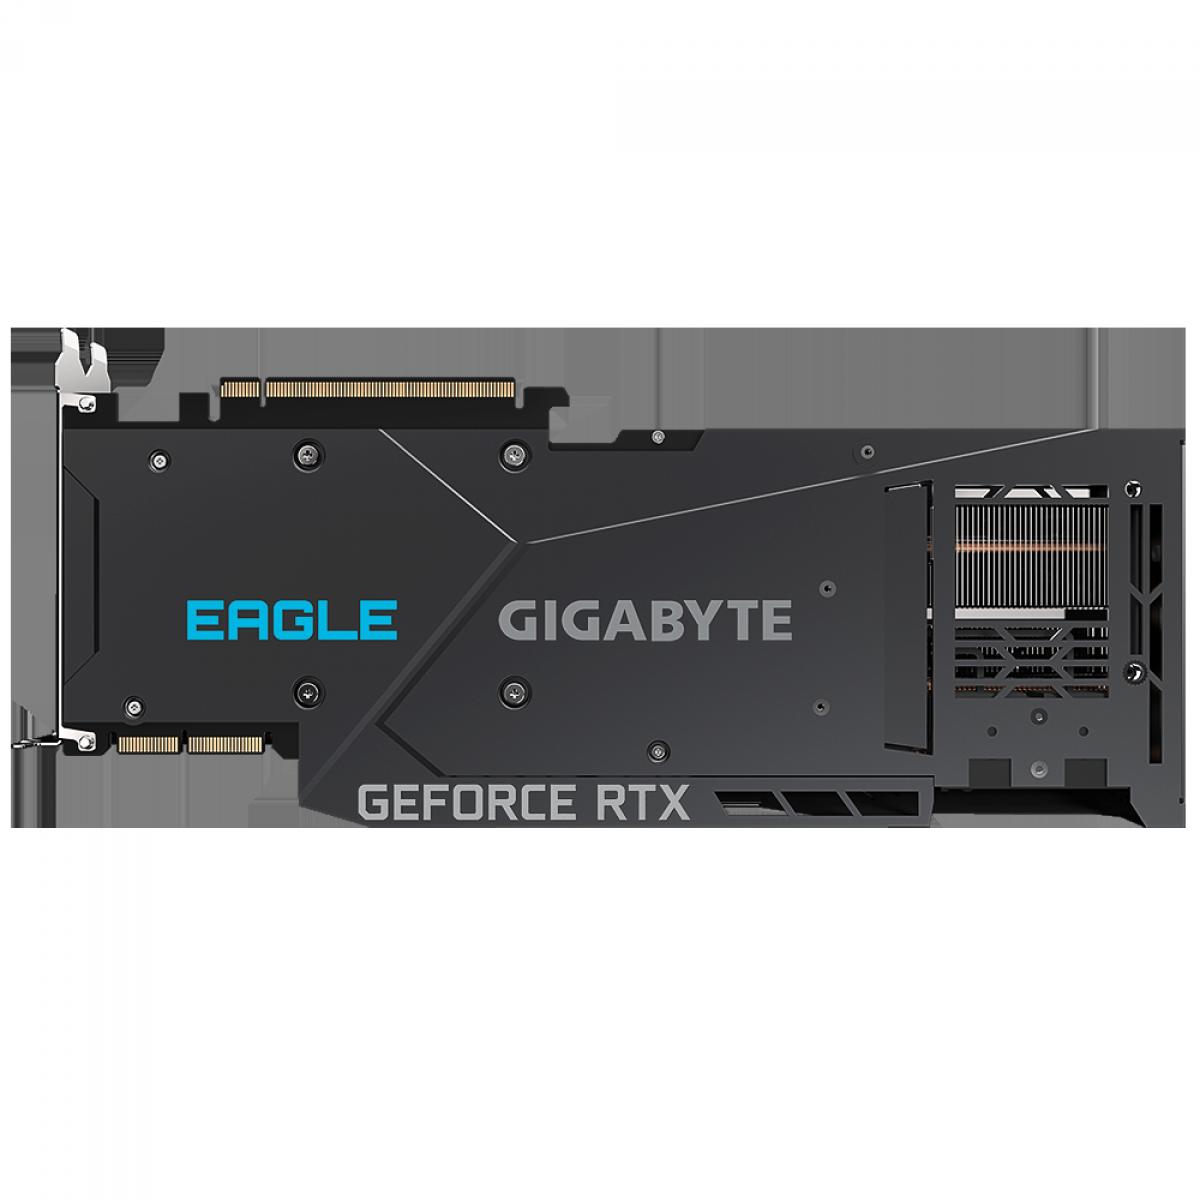 Placa de Vídeo Gigabyte GeForce, RTX 3090 Eagle OC 24G, 24GB, GDDR6X, 384Bit, GV-N3090EAGLE OC-24GD